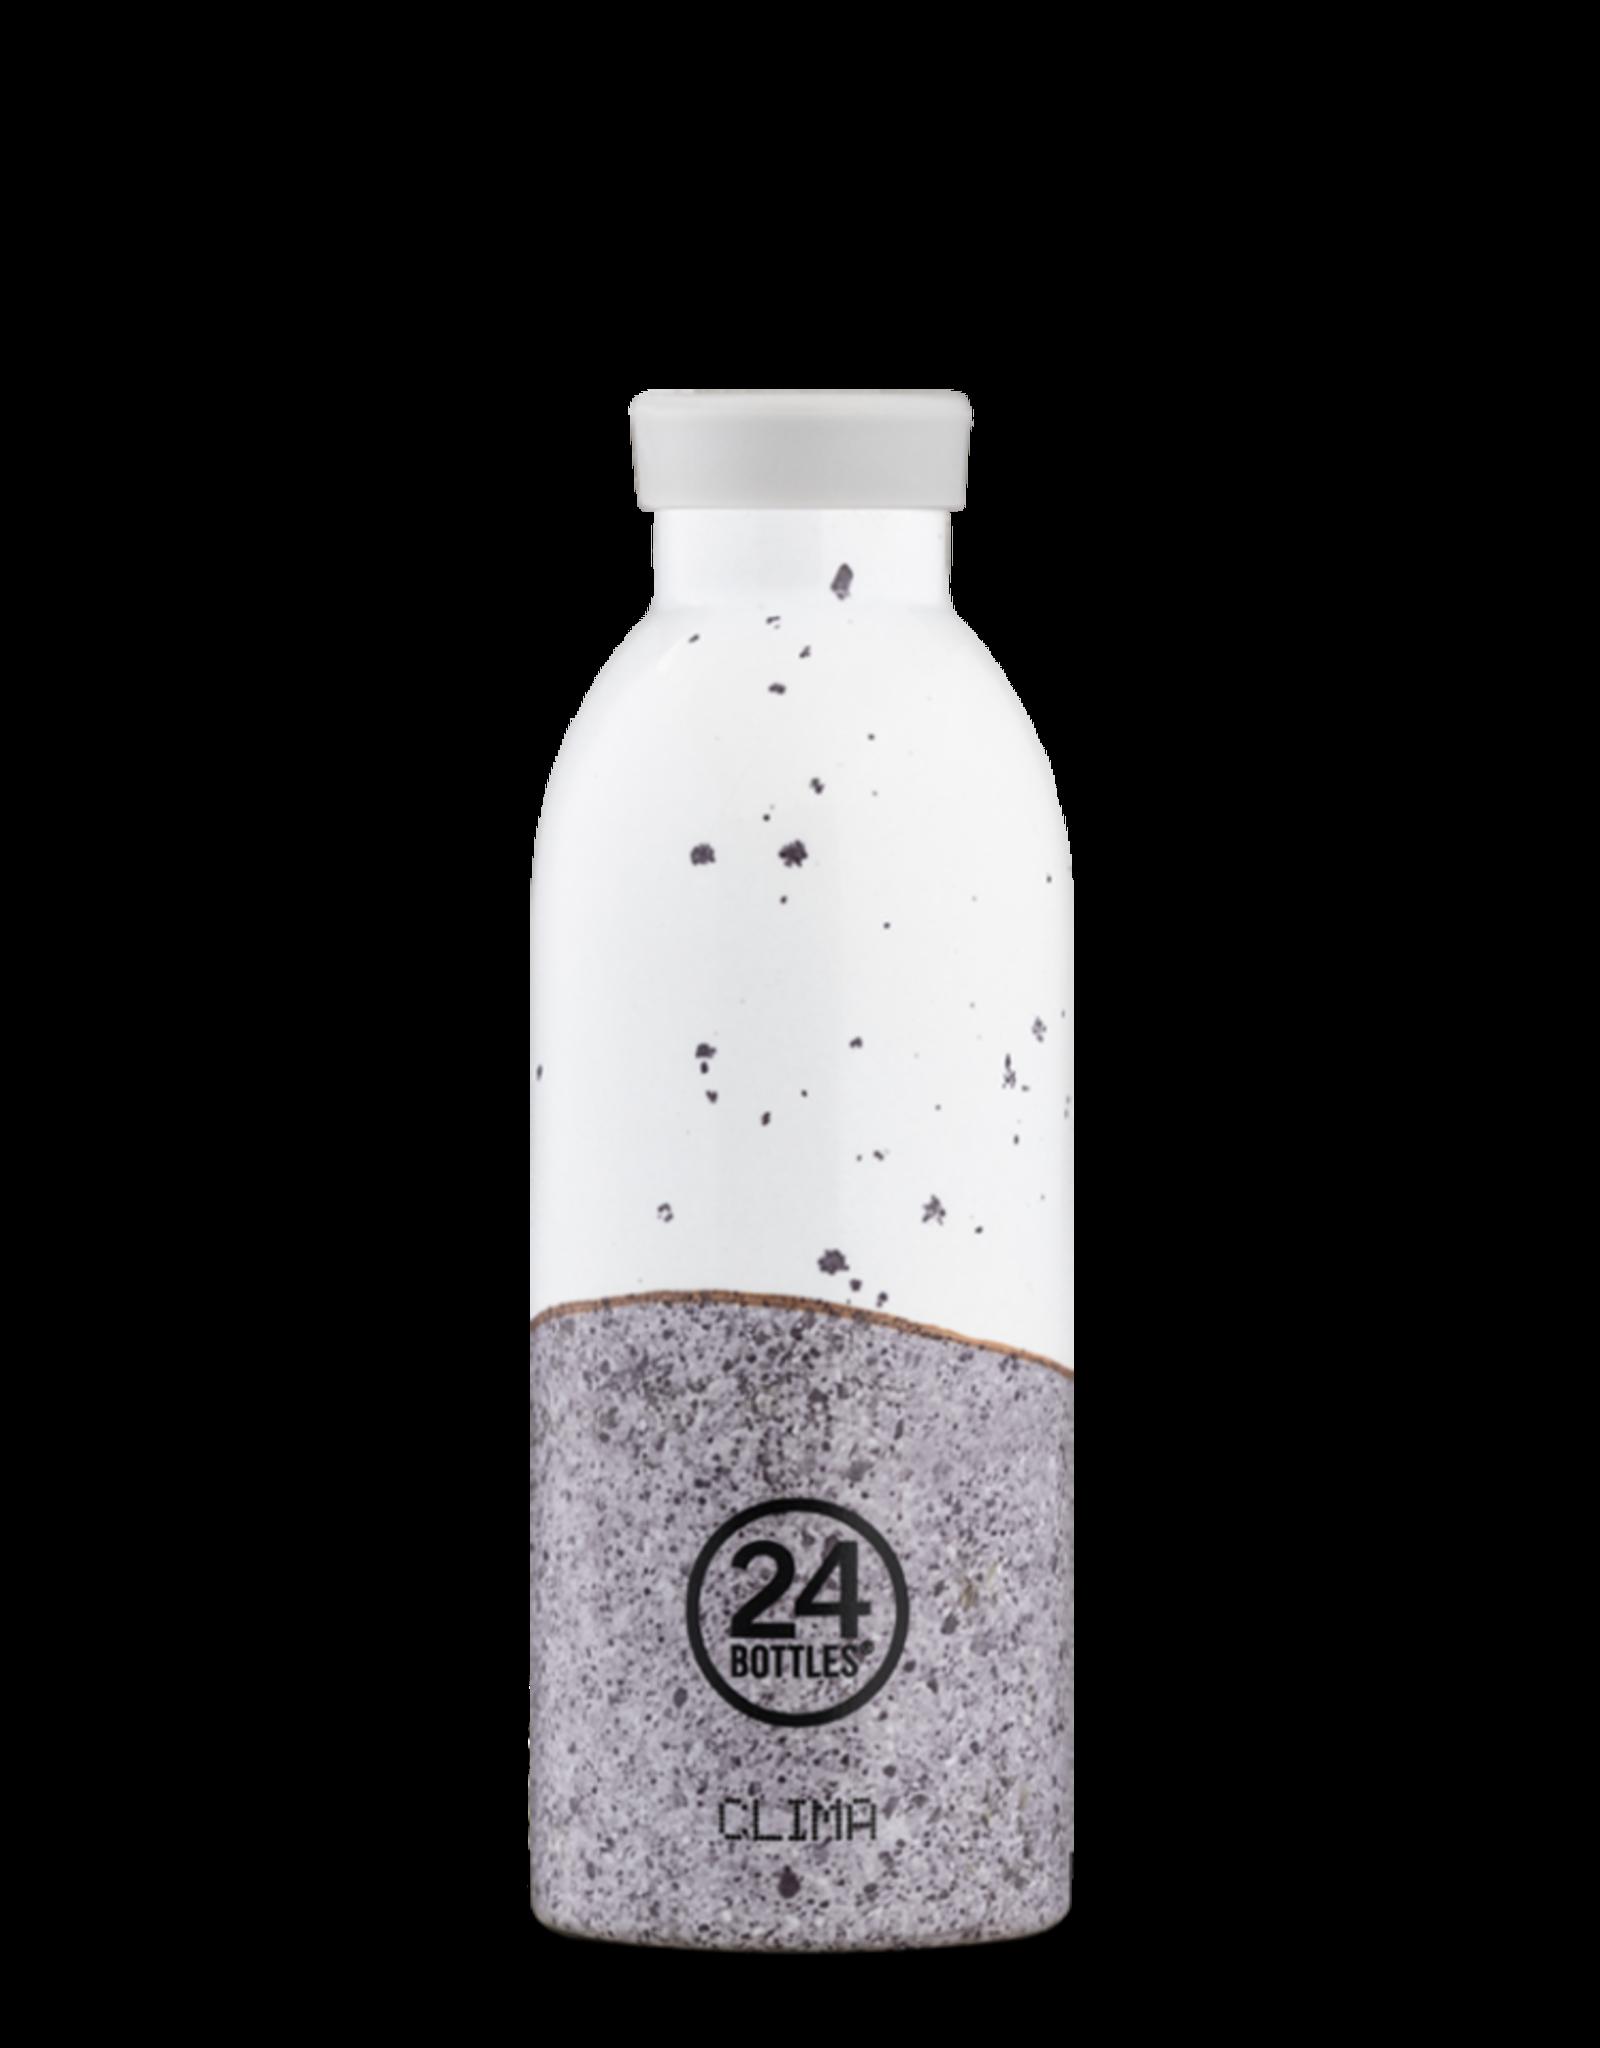 24 bottles Clima tea infuser bottle - Wabi 500 ml